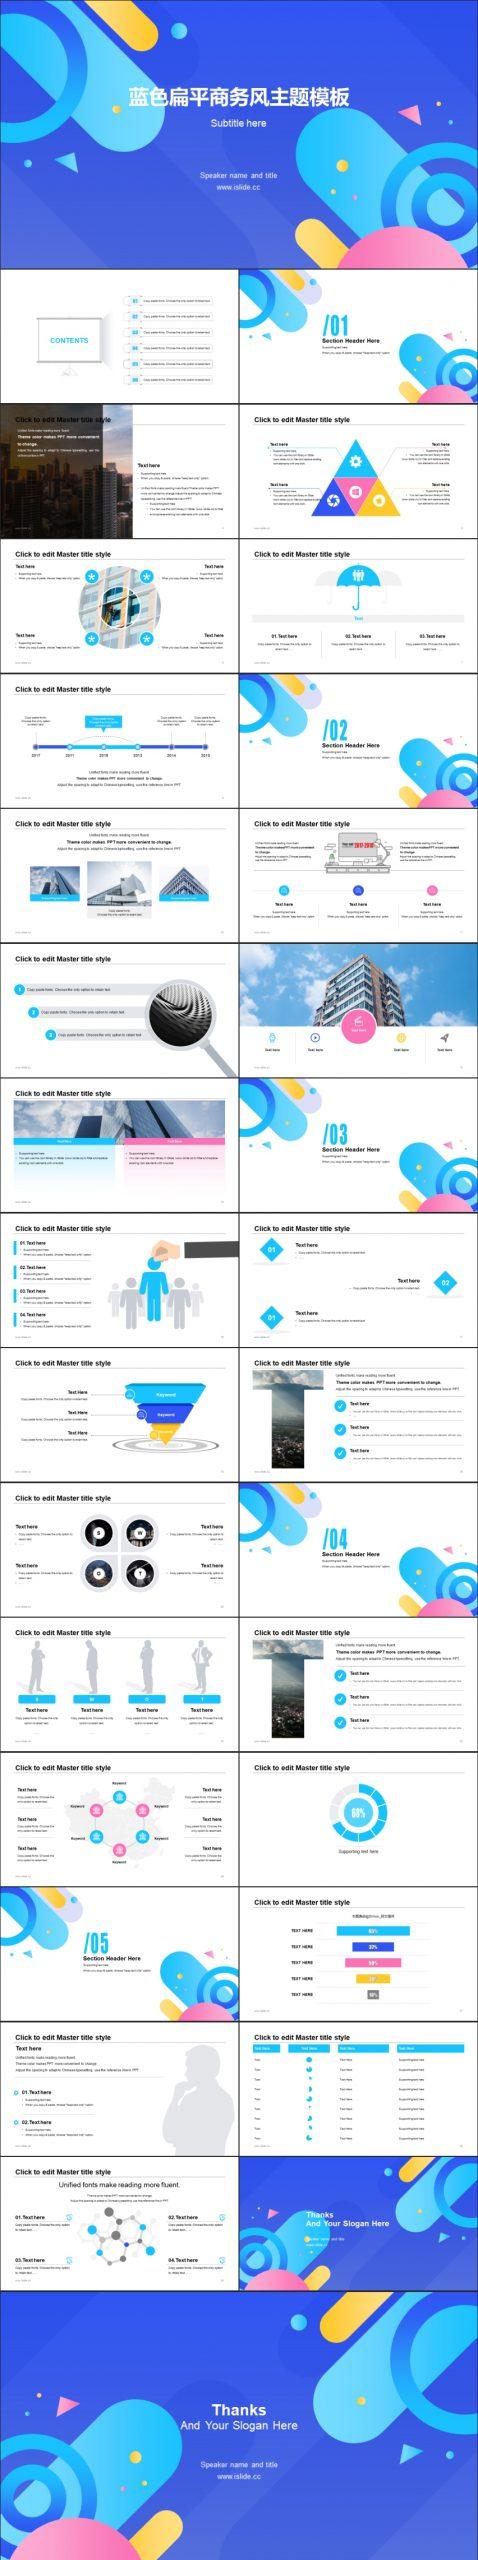 iSlide蓝色扁平商务风PPT模板下载_预览图2